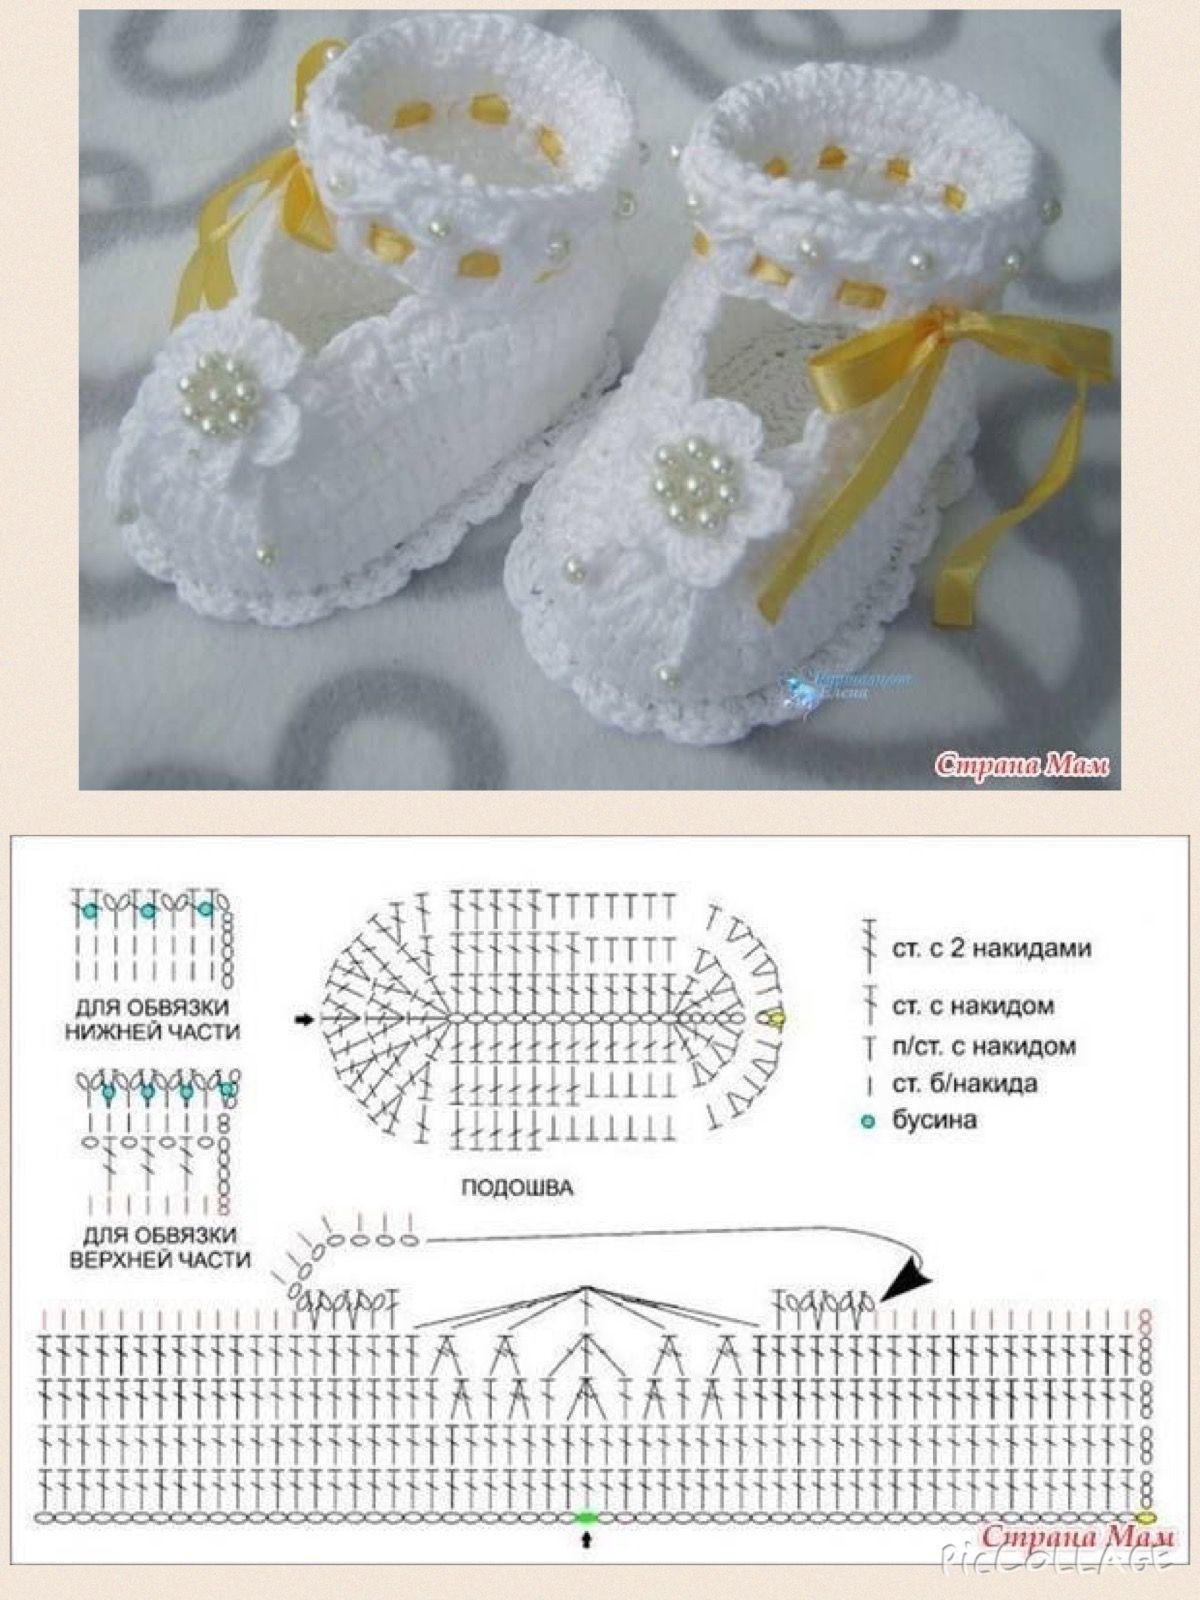 Pin de marta bosch en crochet bébé | Pinterest | Zapatitos bebe ...